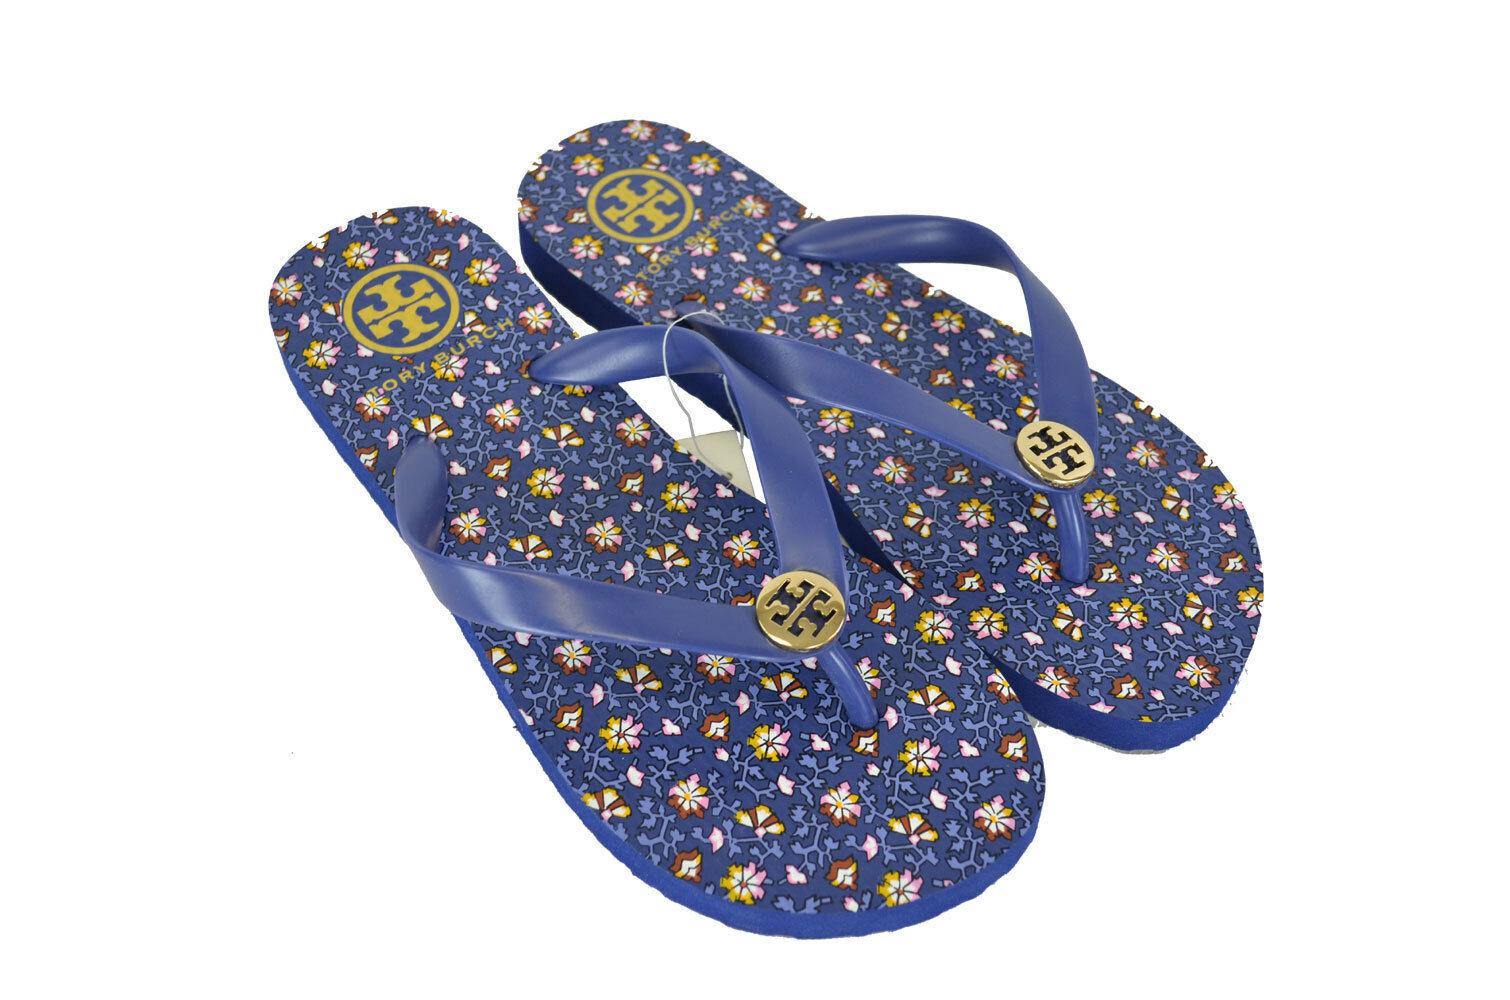 Tory Burch Tongs String Sandales Floral bleu pasny 7